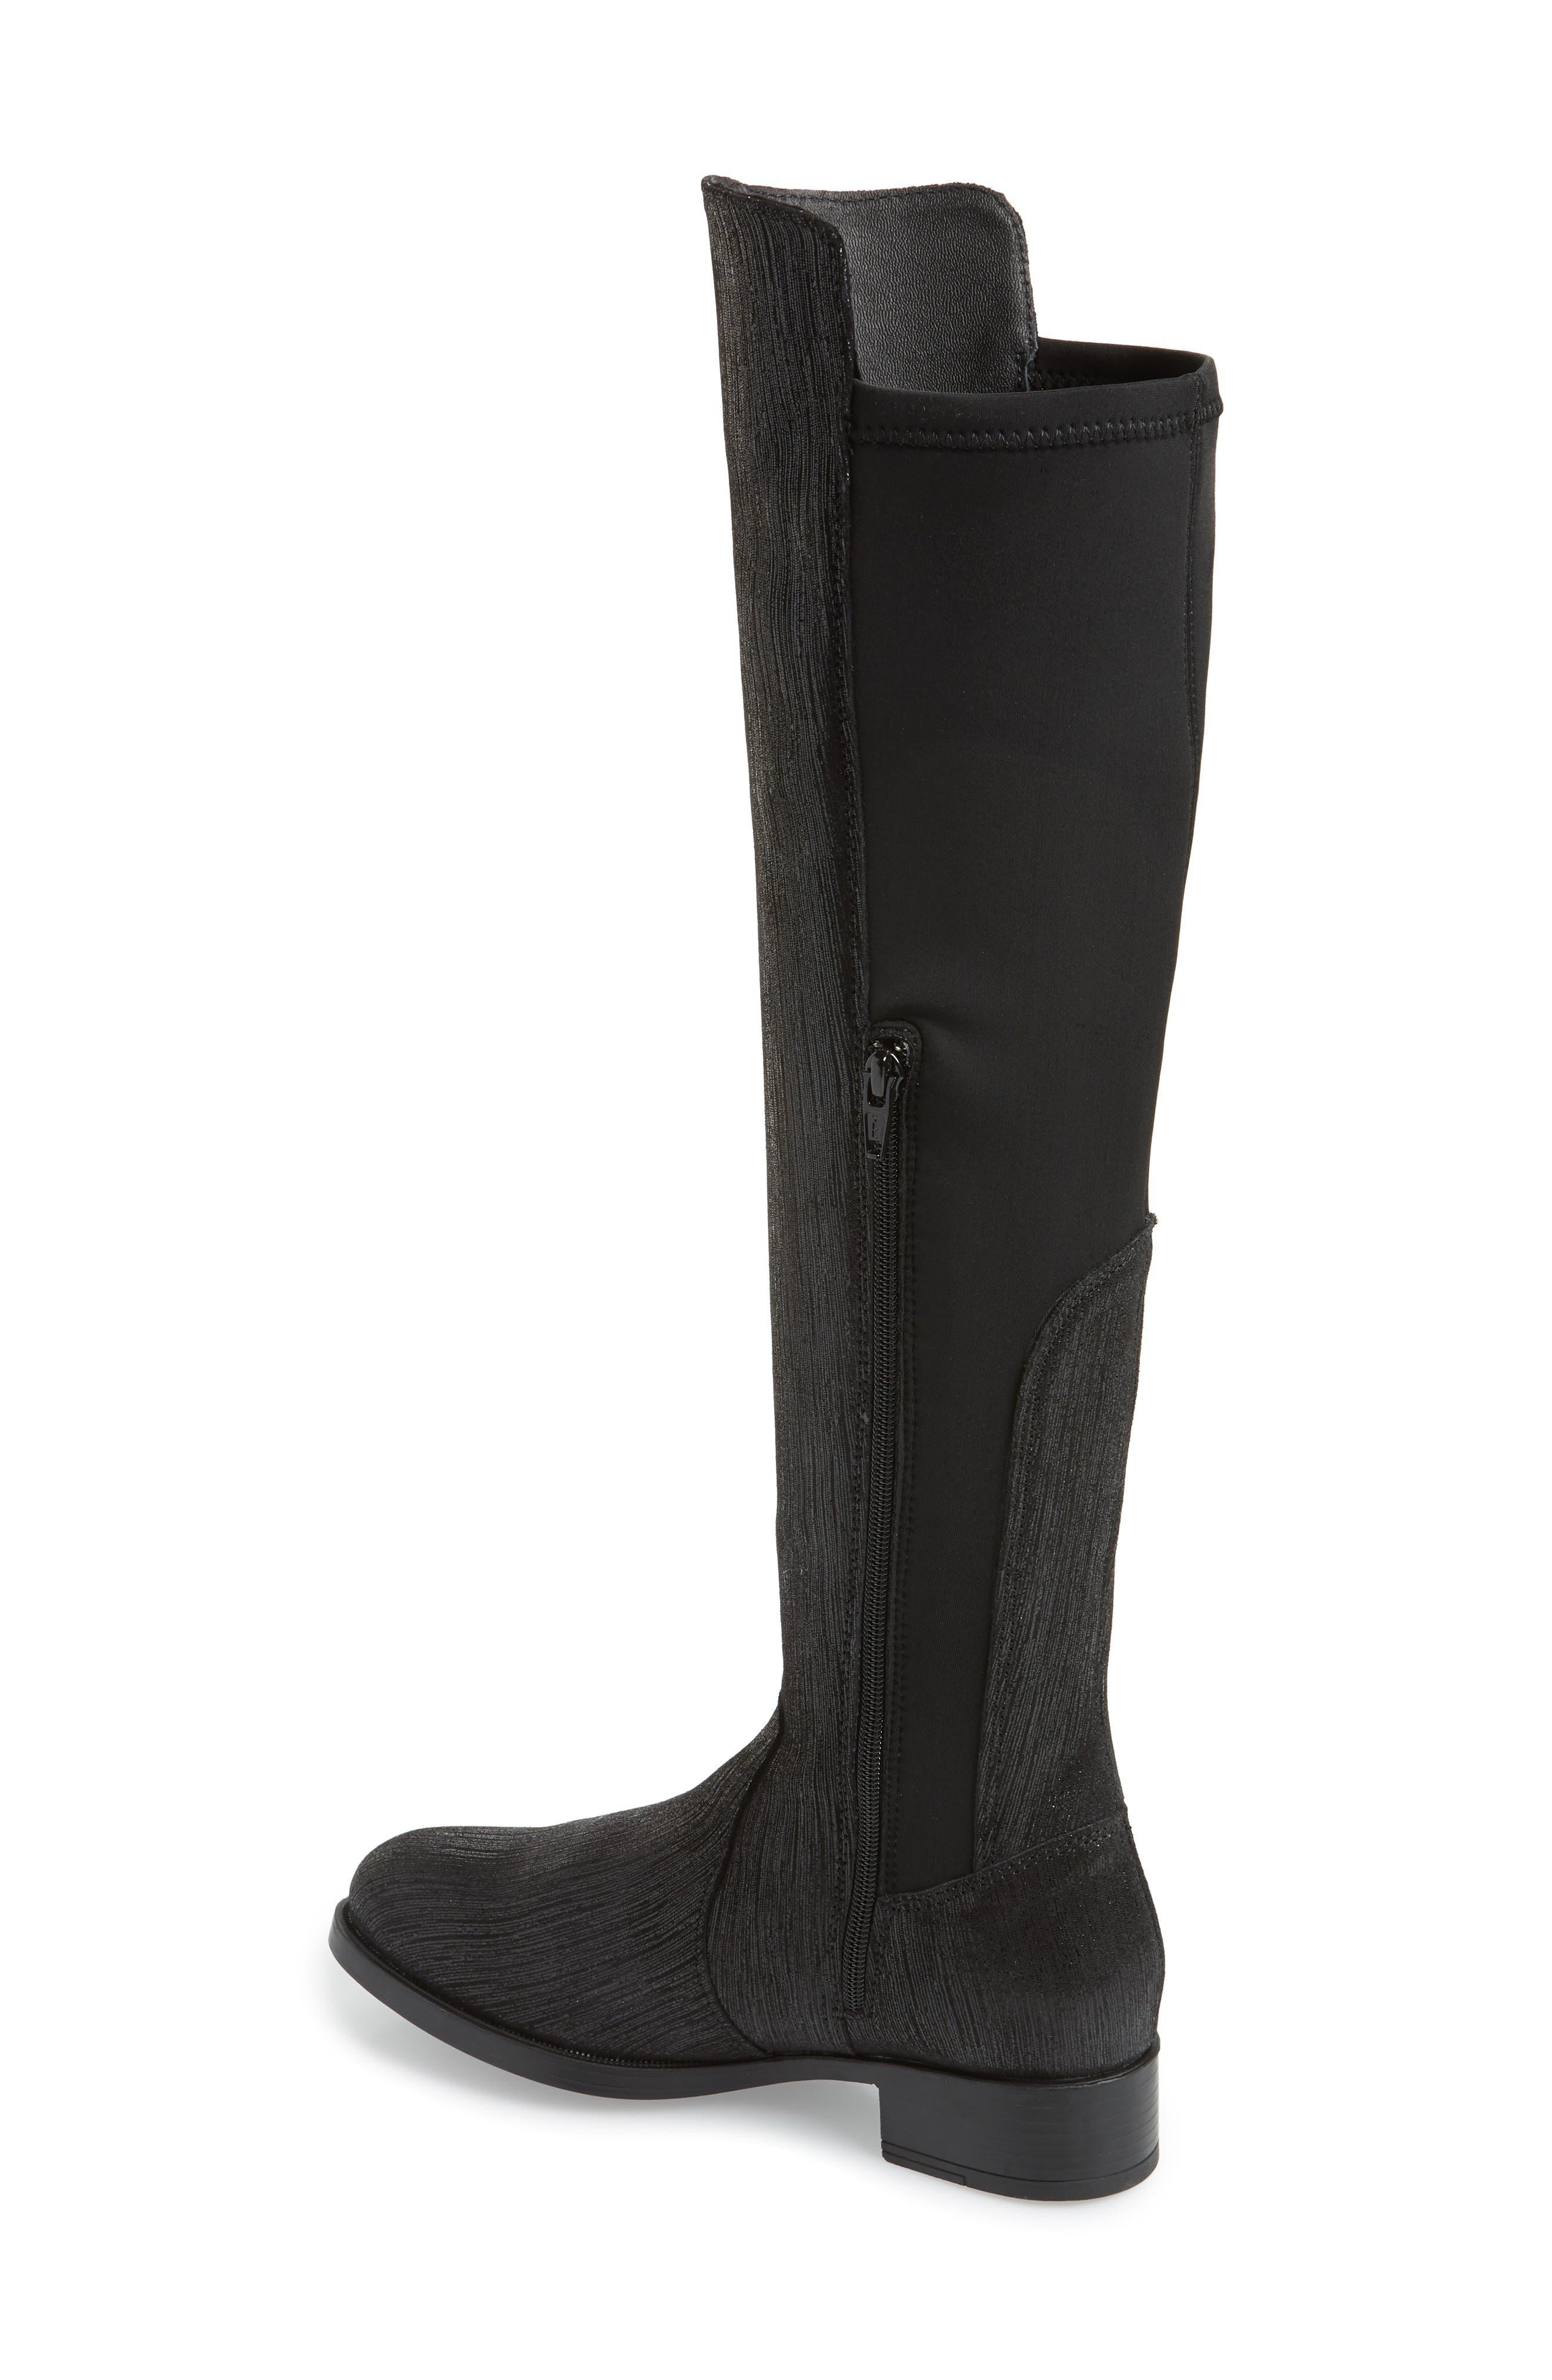 BOS. & CO., Bunt Waterproof Over the Knee Boot, Alternate thumbnail 2, color, BLACK METAL/ LYCRA